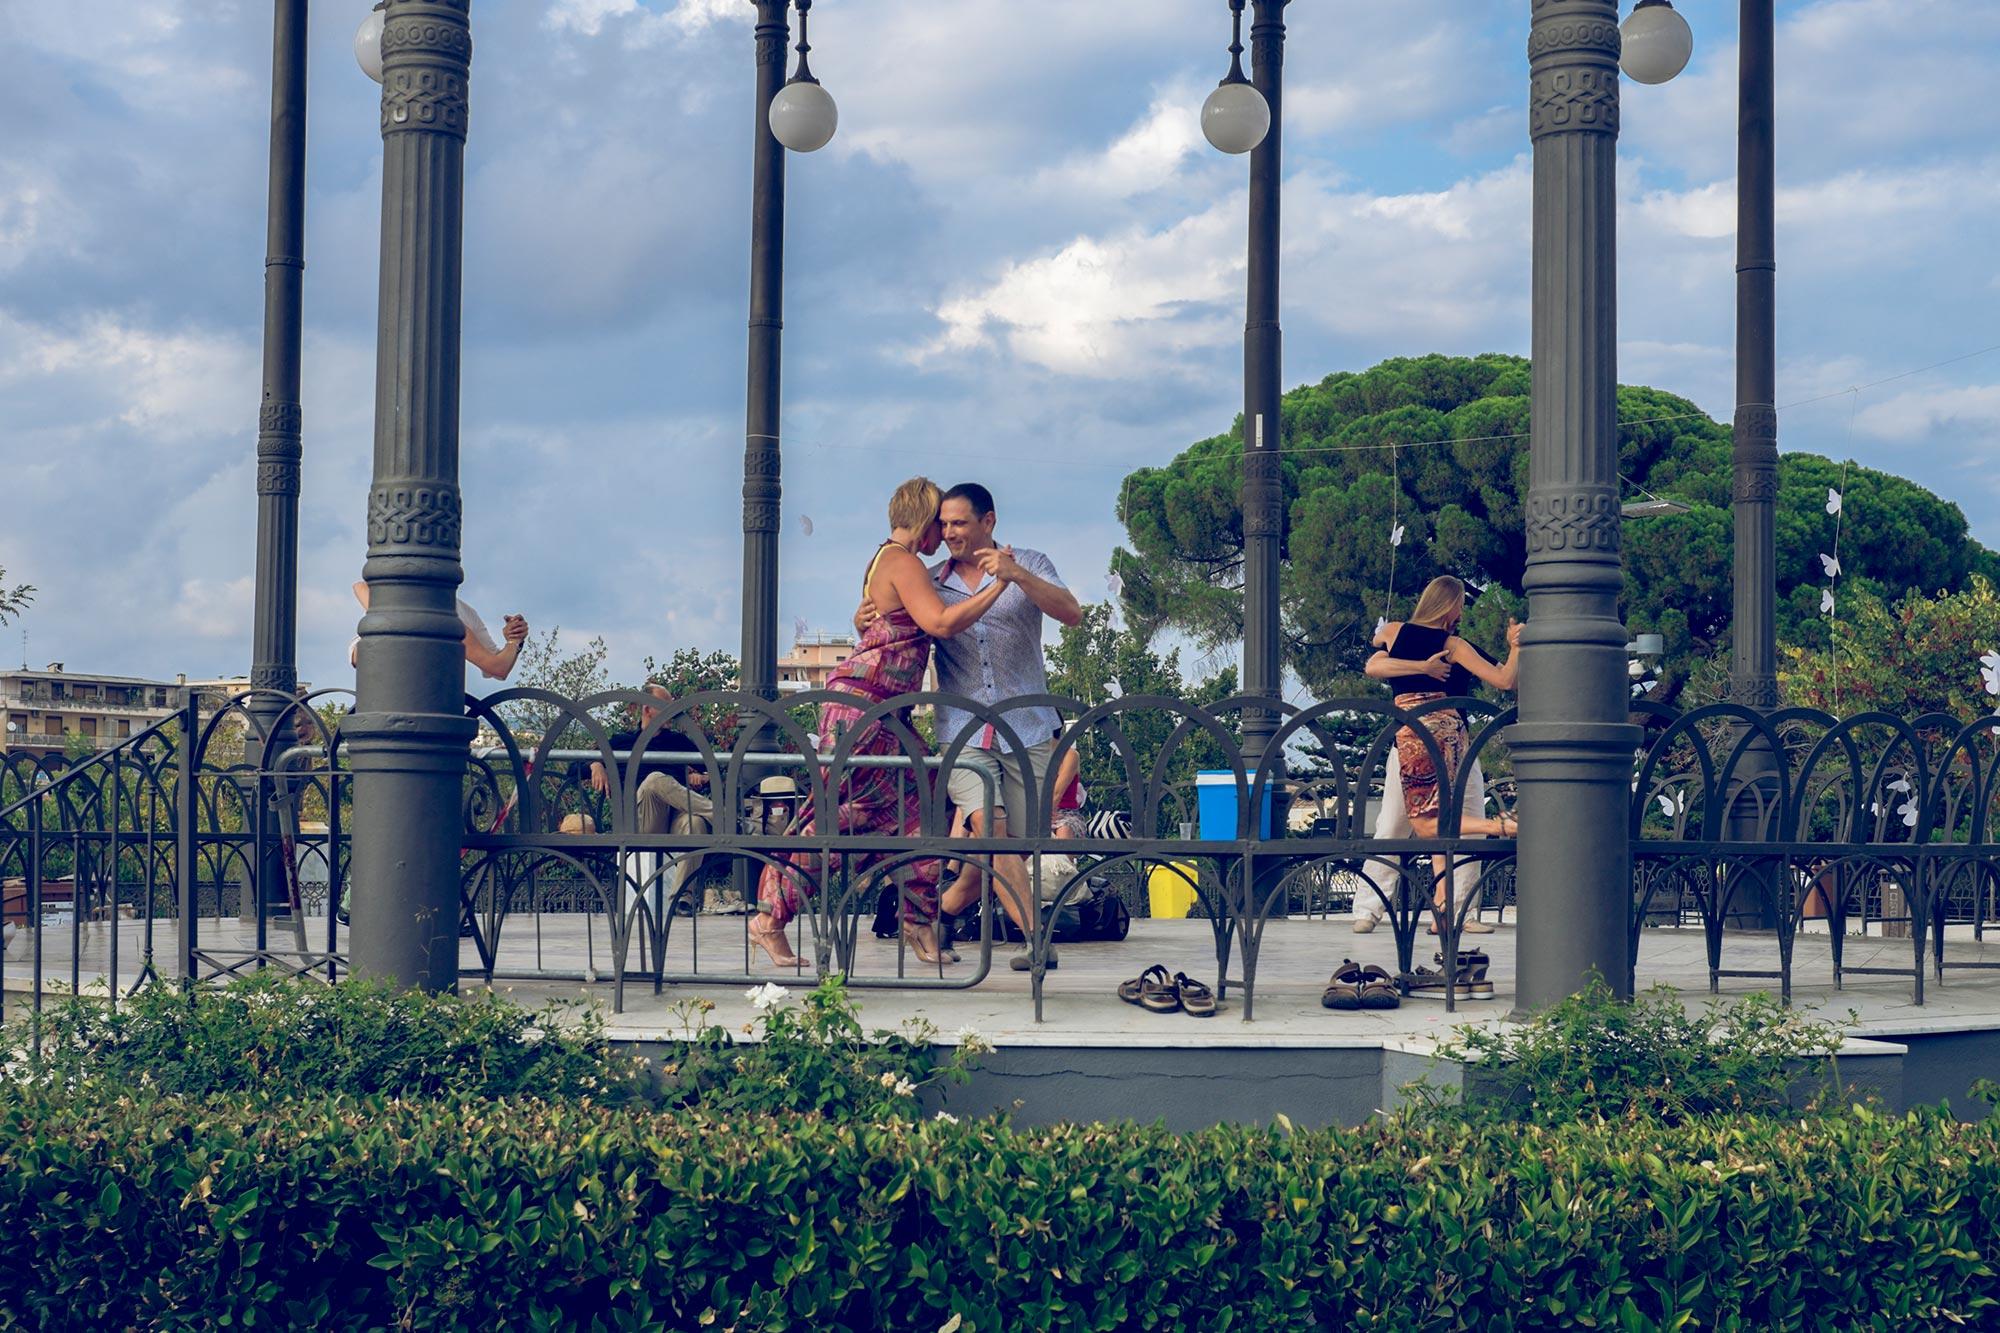 italy-sicilia-catania-giardino-bellini-tango